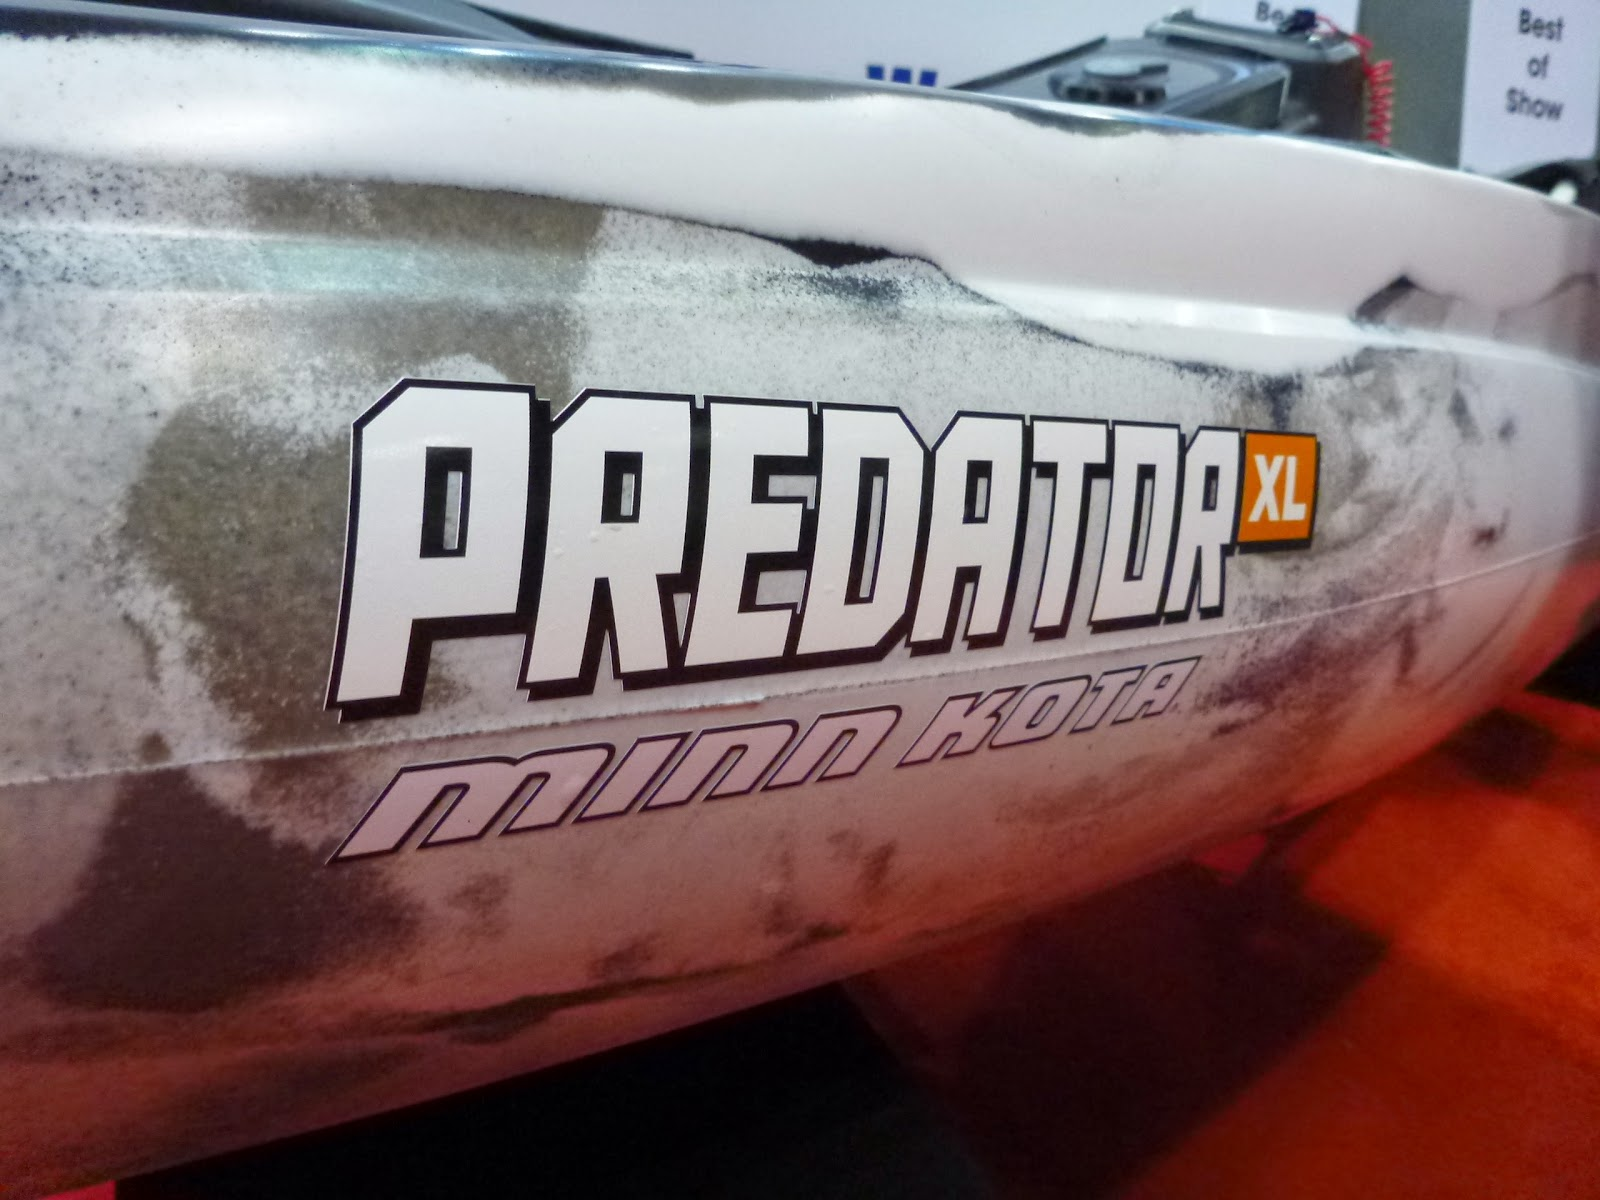 Old Town Predator Kayak XL Minn Kota